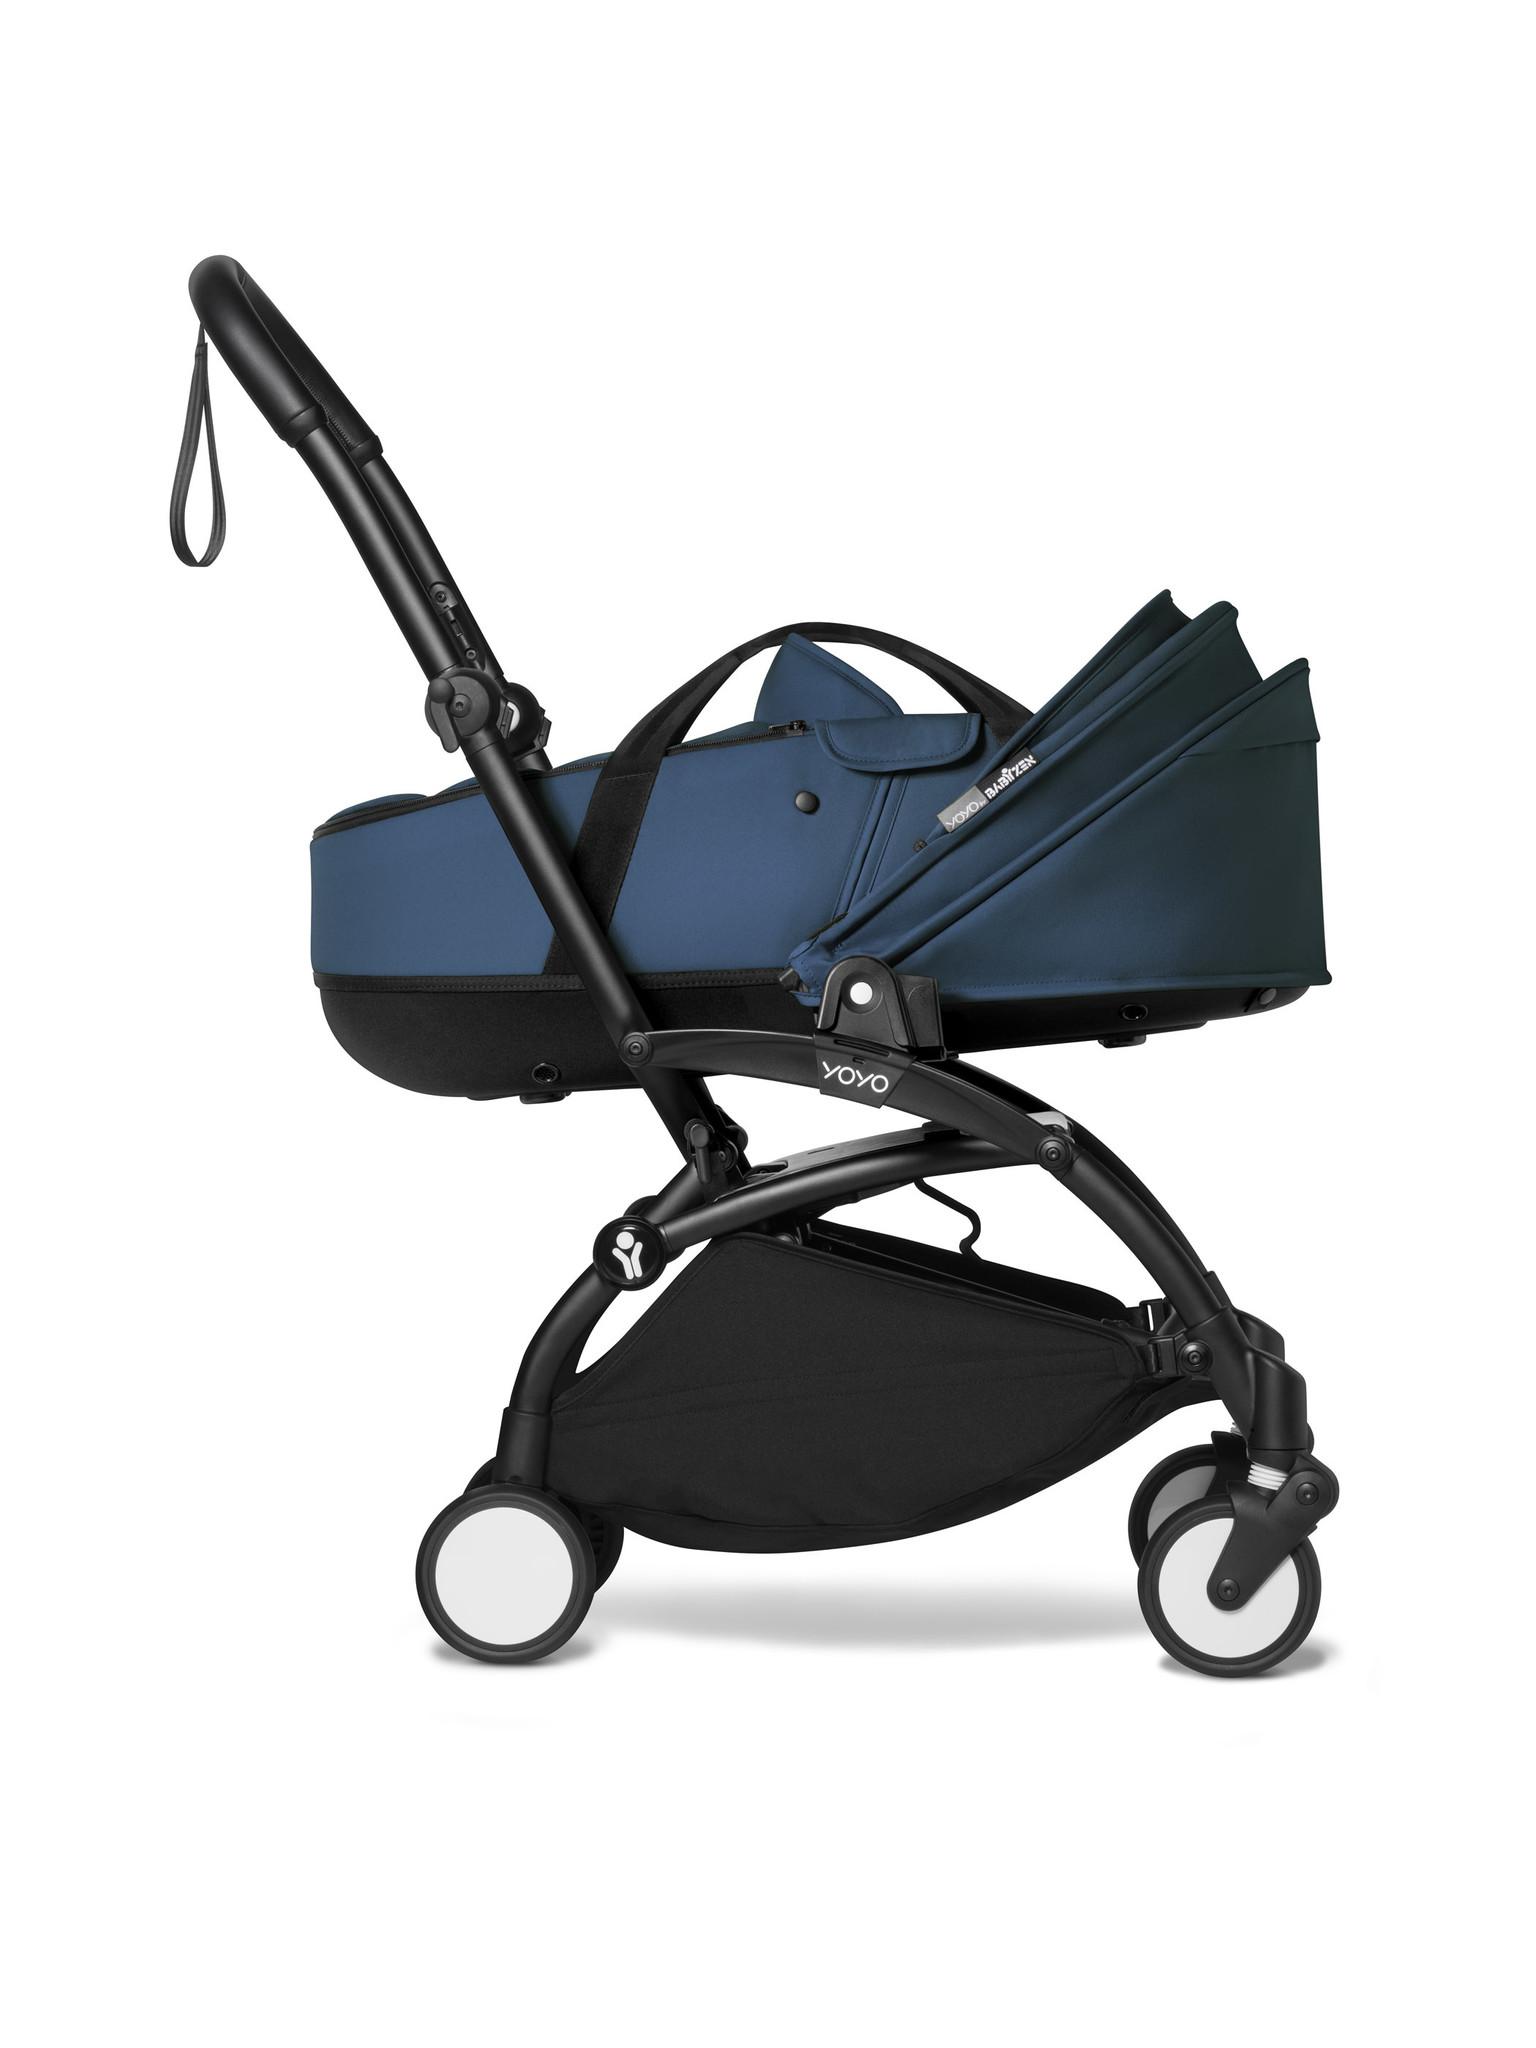 Babyzen Babyzen YOYO² zwart frame met YOYO Bassinet - reiswieg - Navy blue